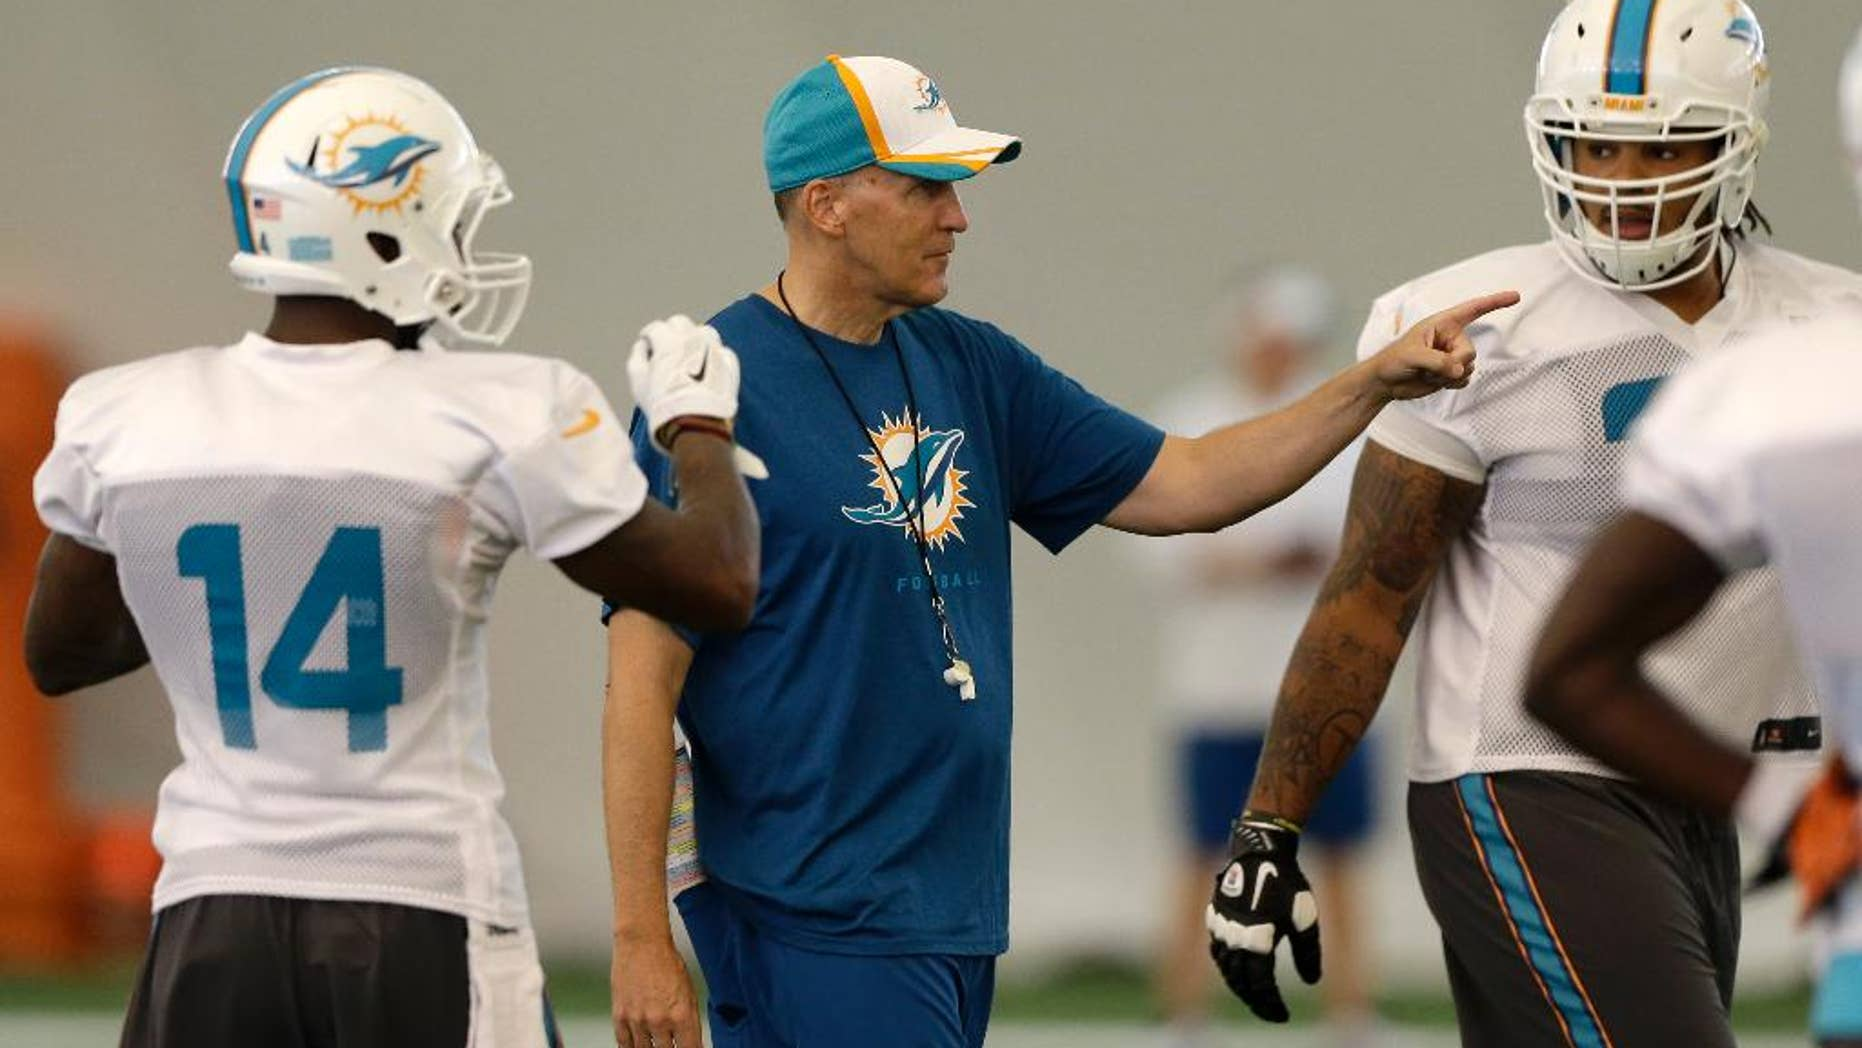 Miami Dolphins head coach Joe Philbin gestures during NFL football training camp in Davie, Fla., Wednesday, July 30, 2014. (AP Photo/Alan Diaz)